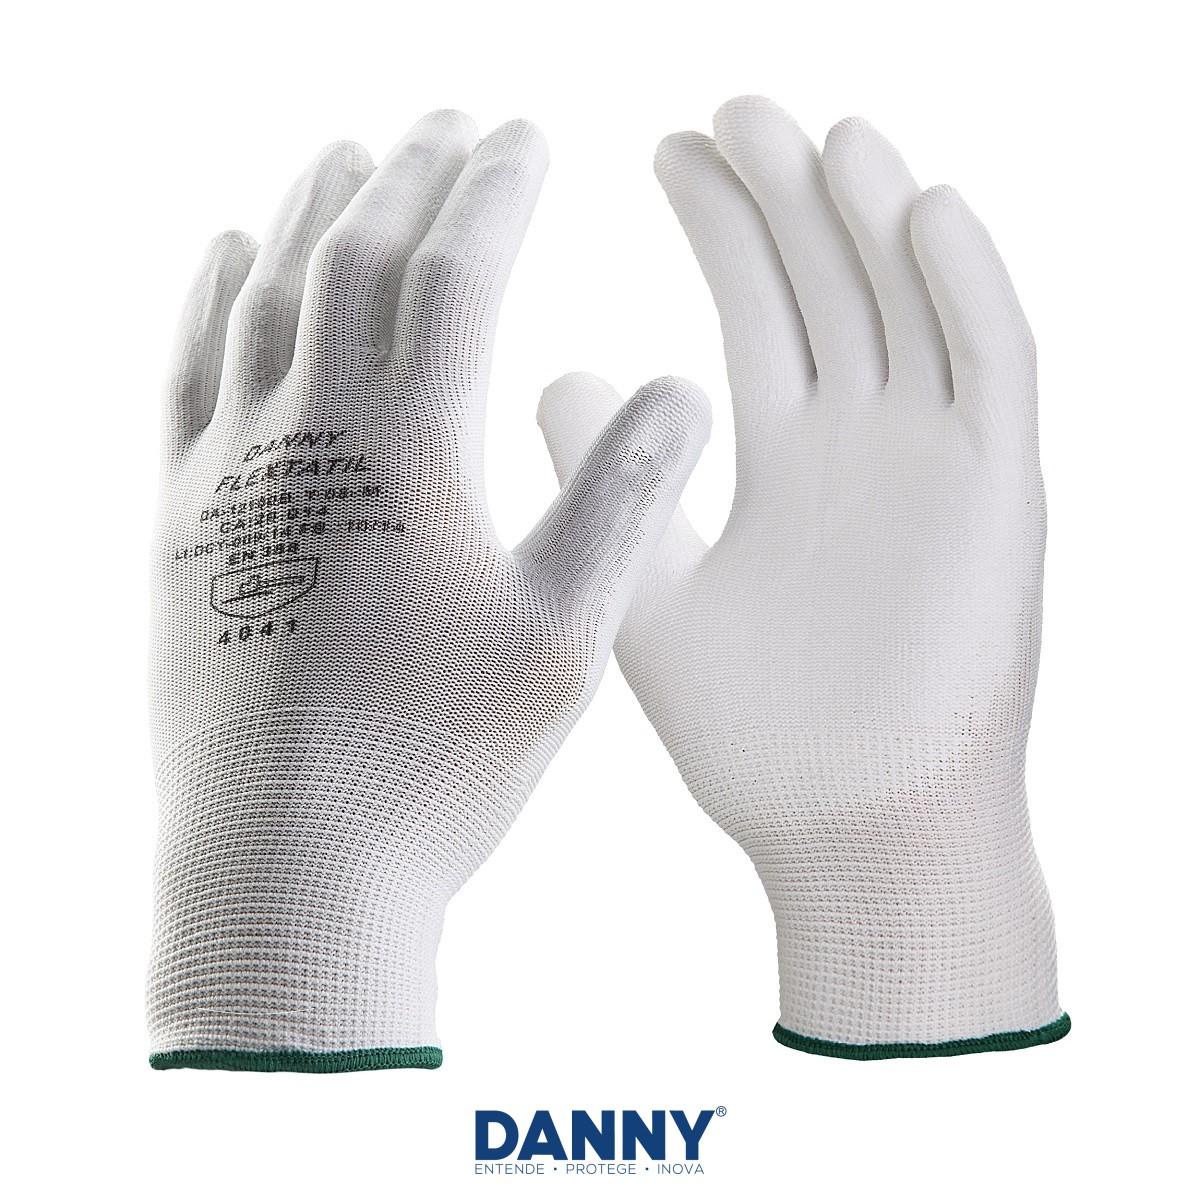 Luva Danny Flextatil Sensitiva Diversos Tamanhos